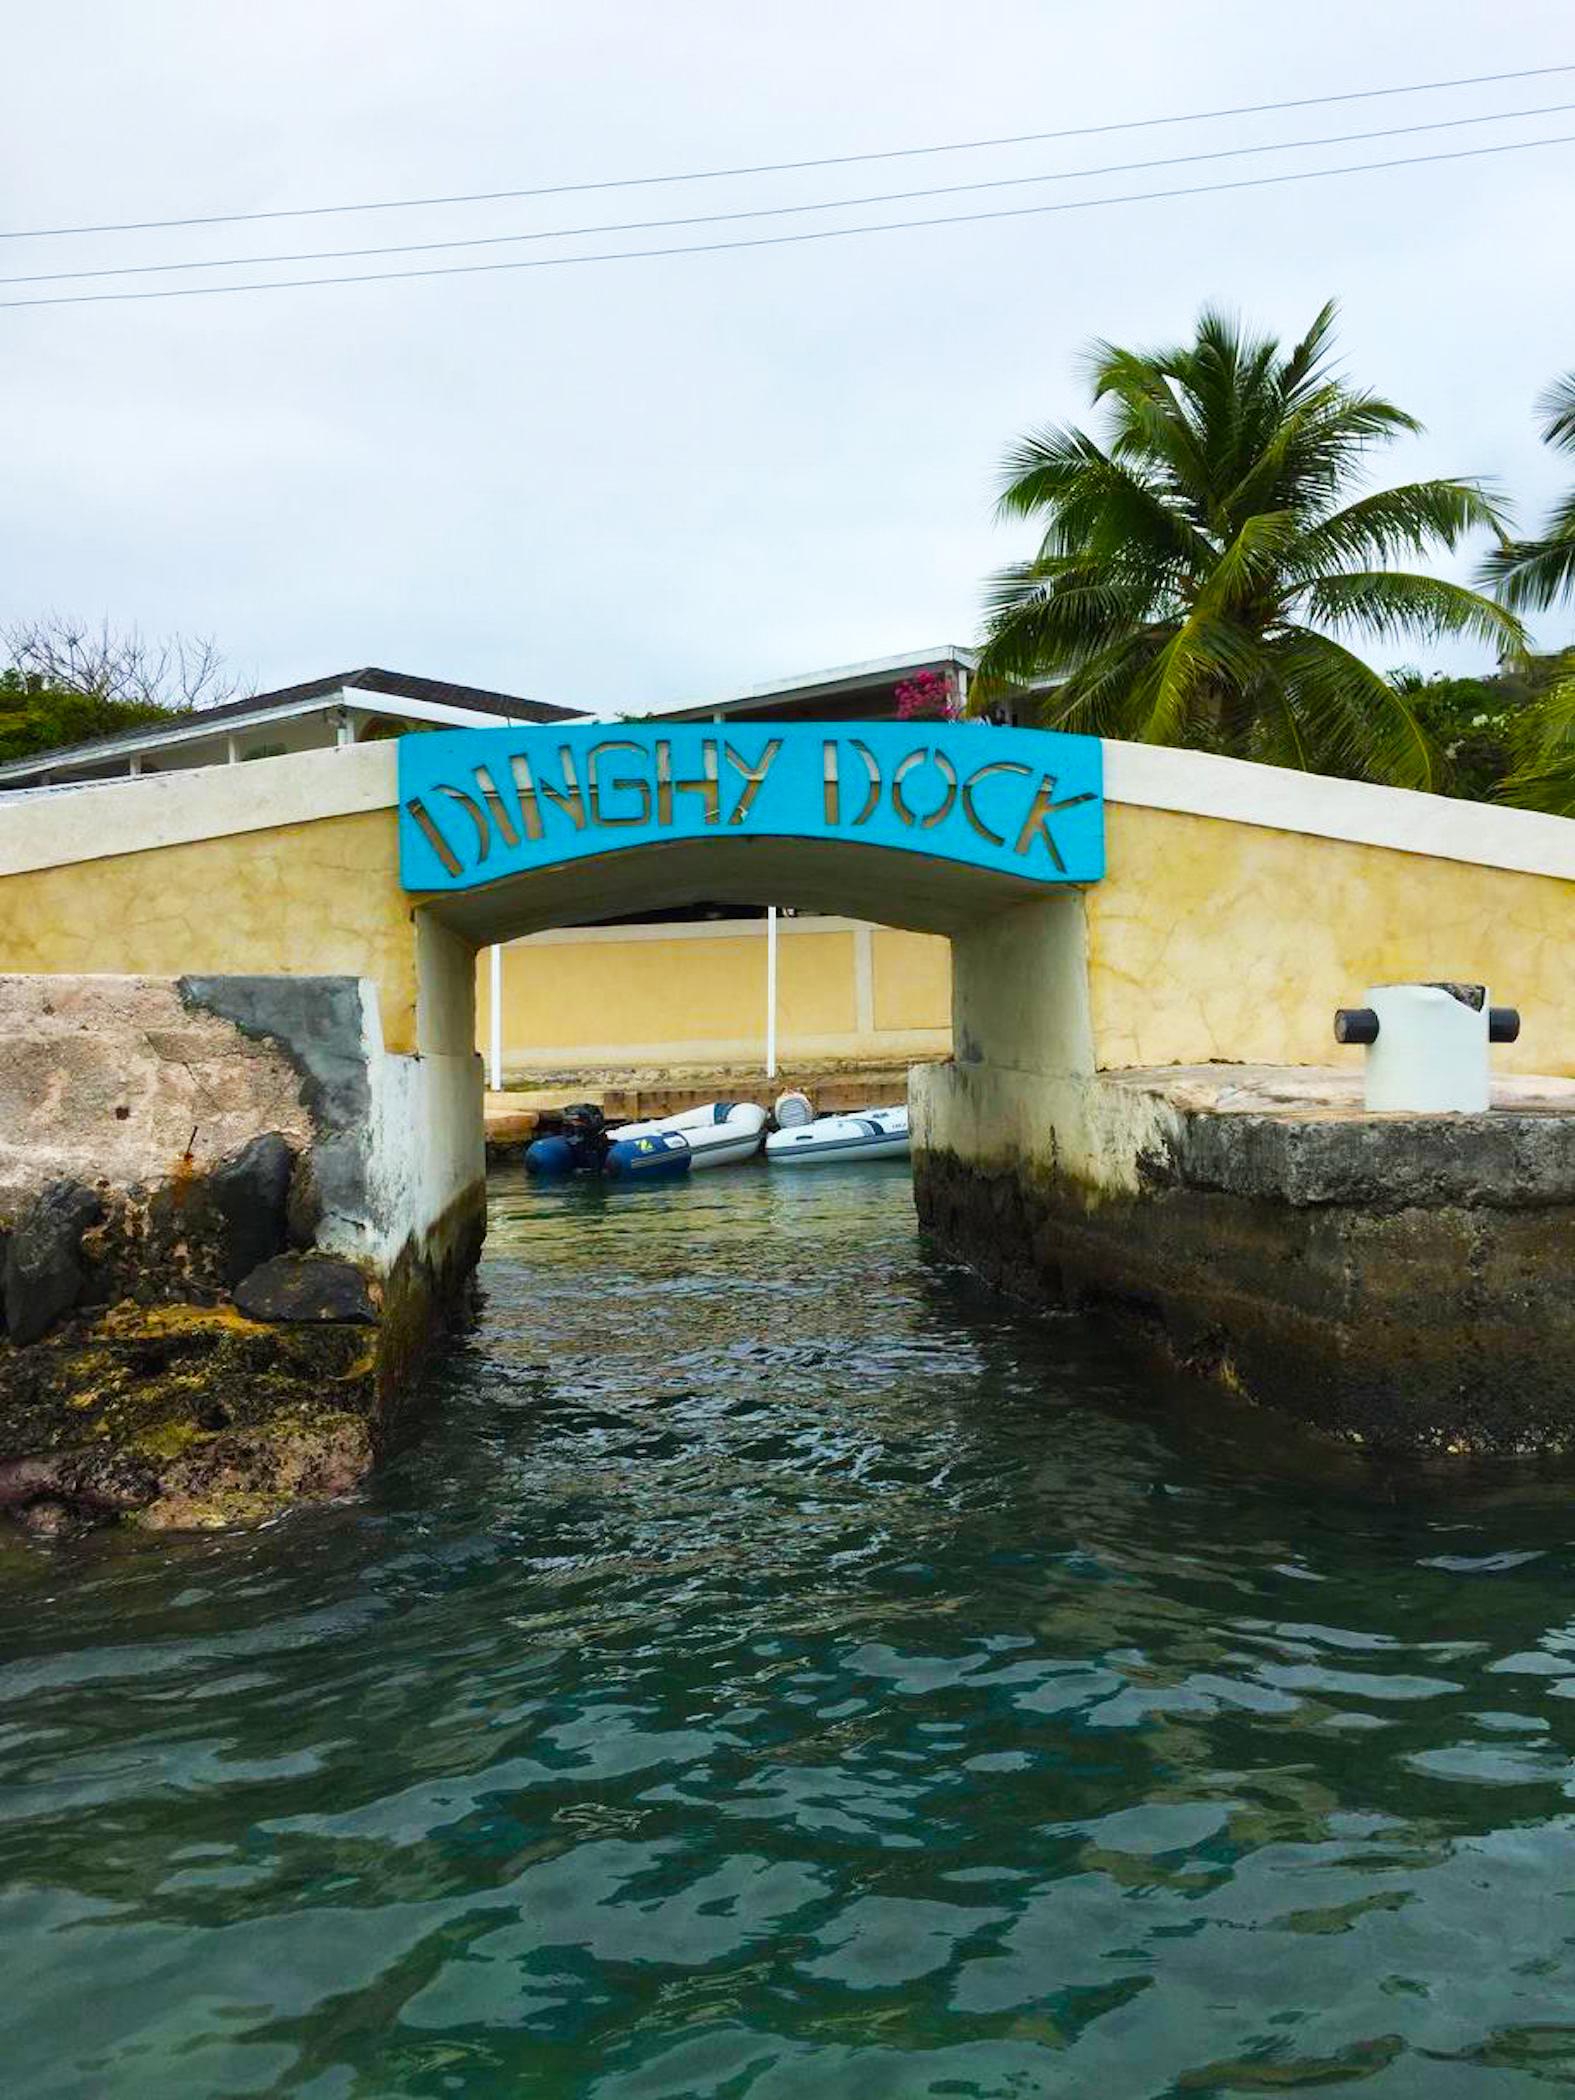 A very fun dinghy dock in Union Island